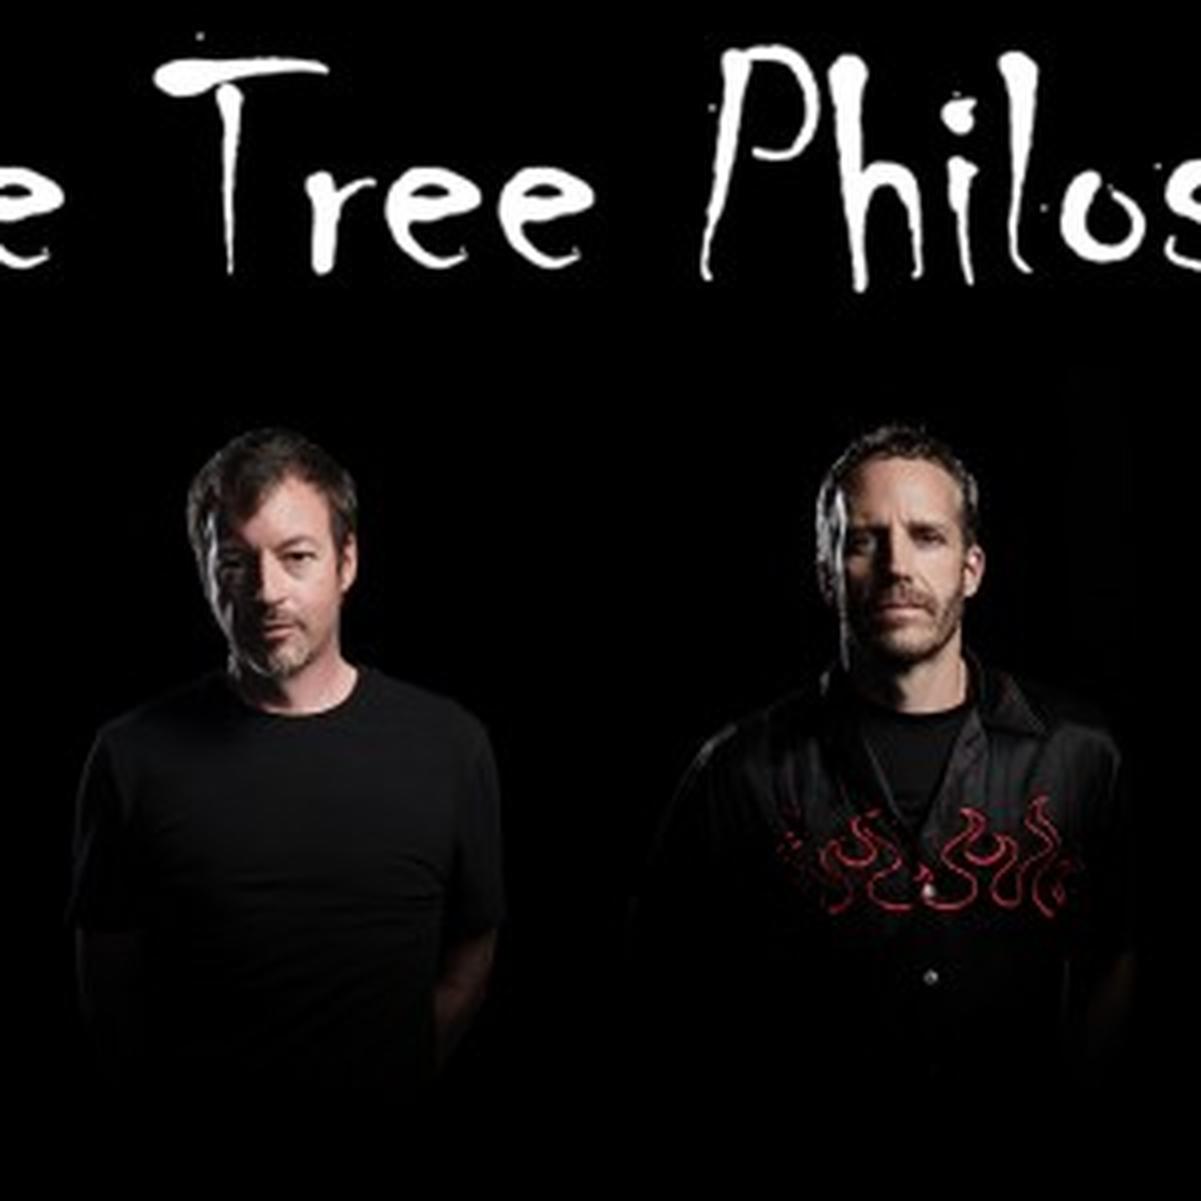 Shade Tree Philosophy